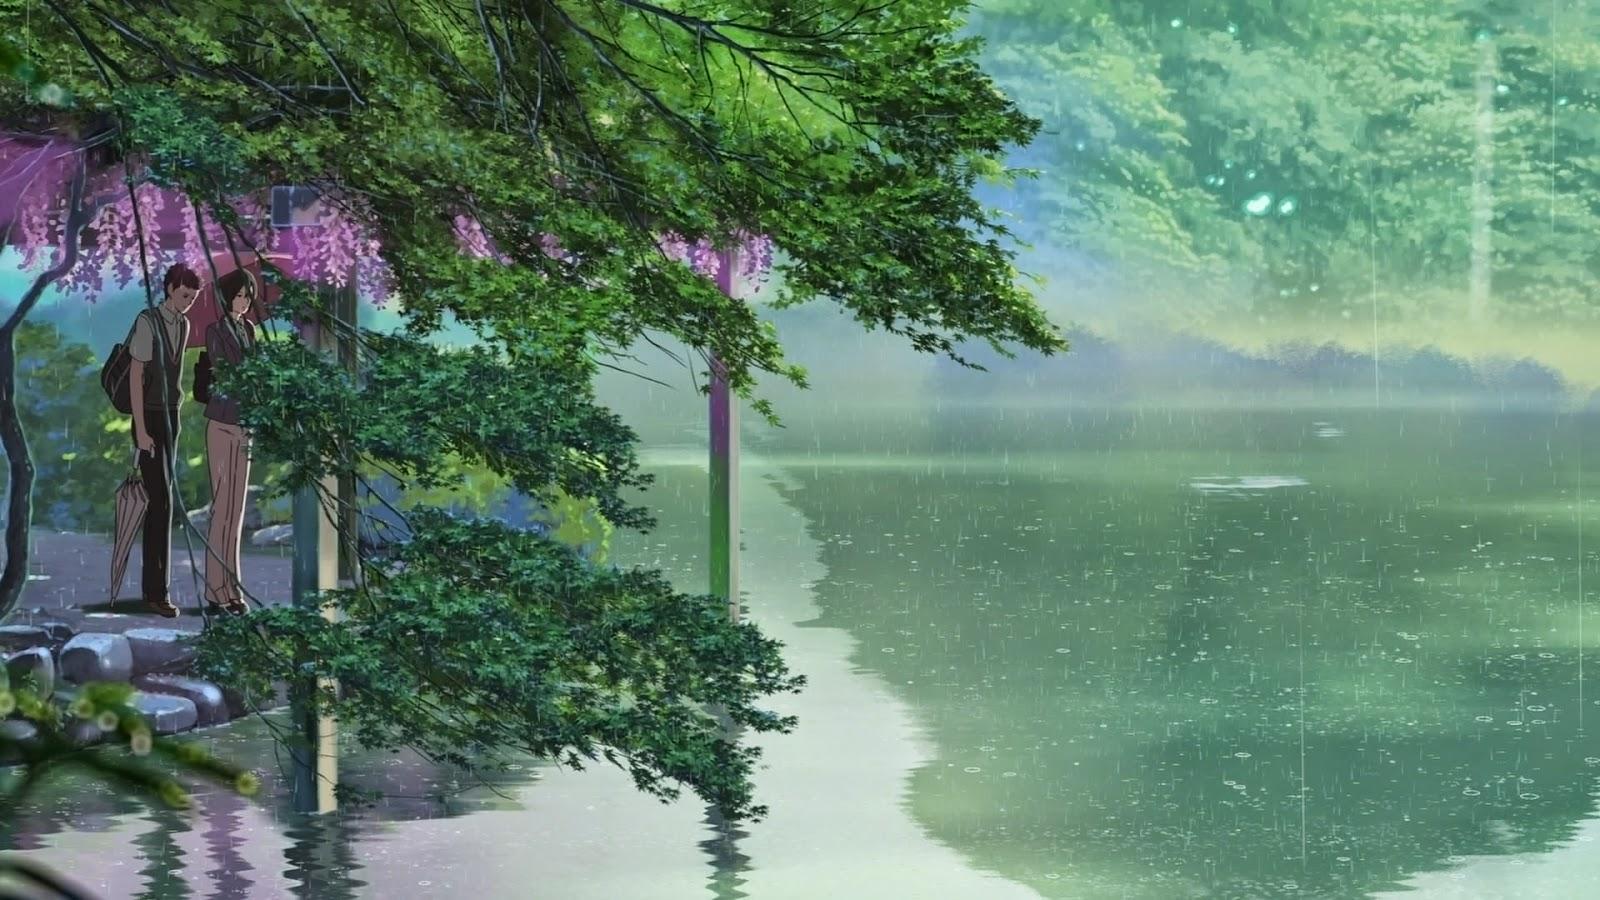 Timber maniacs il giardino delle parole timber romance for Soluzioni il giardino delle parole